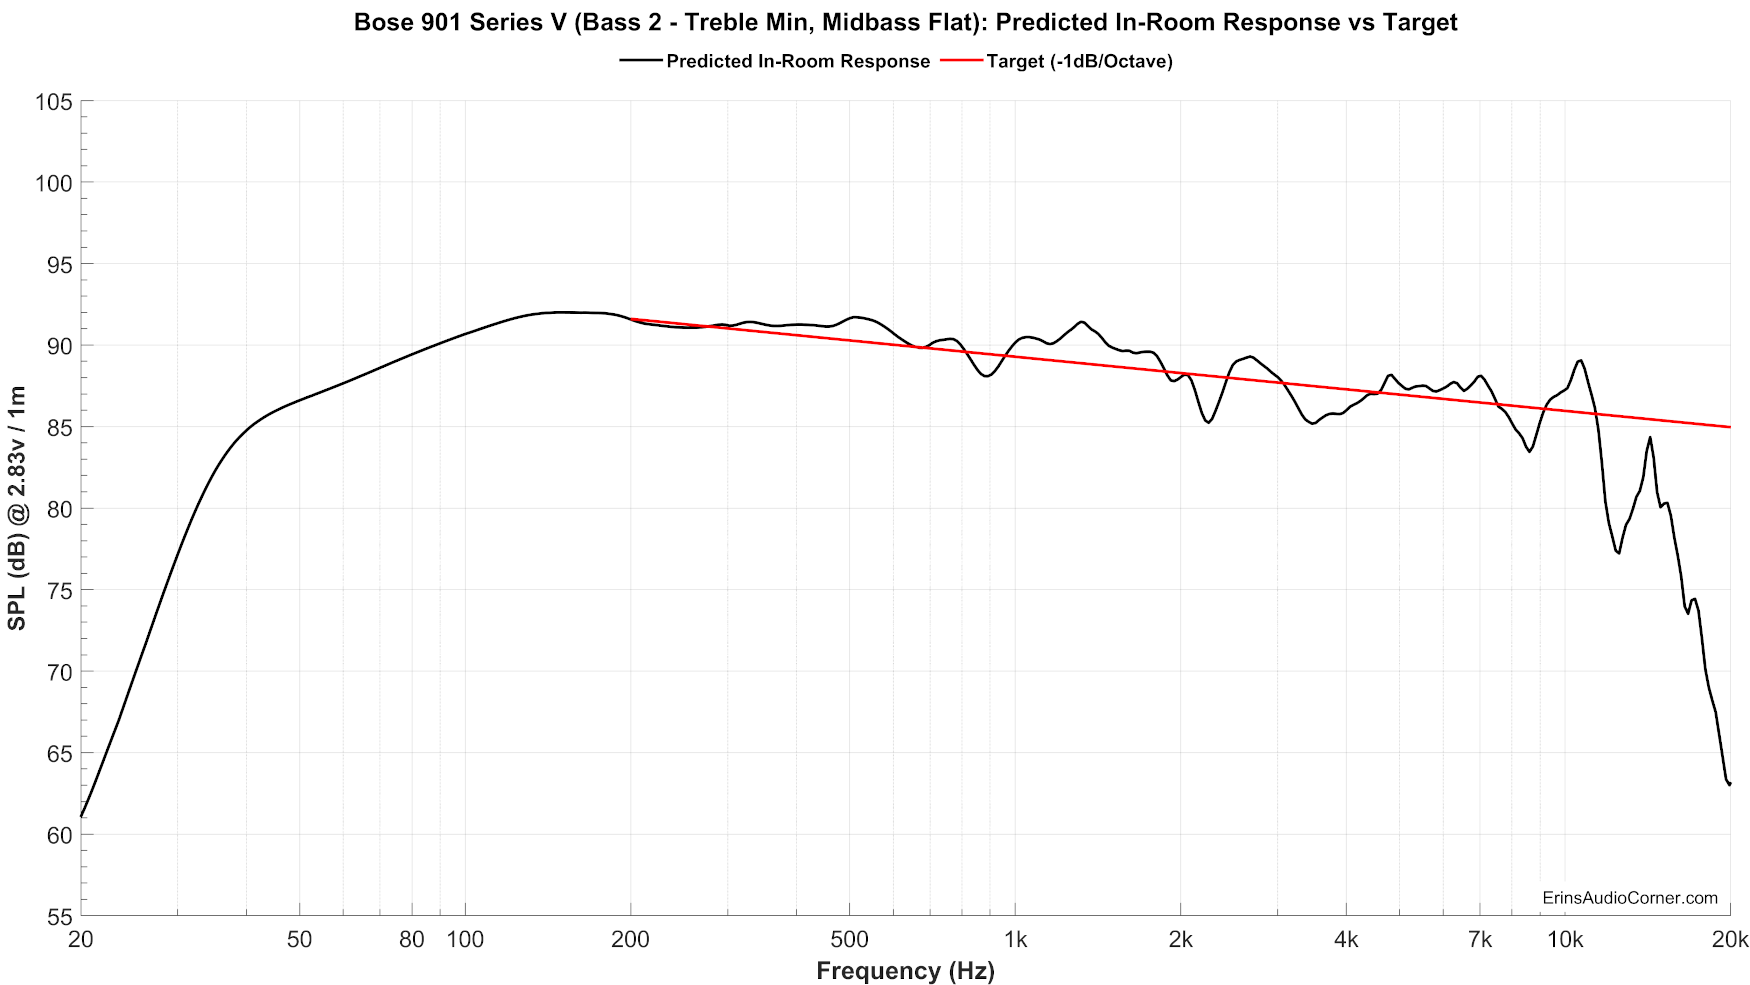 Bose%20901%20Series%20V%20(Bass%202%20-%20Treble%20Min,%20Midbass%20Flat)_Predicted_vs_Target.png